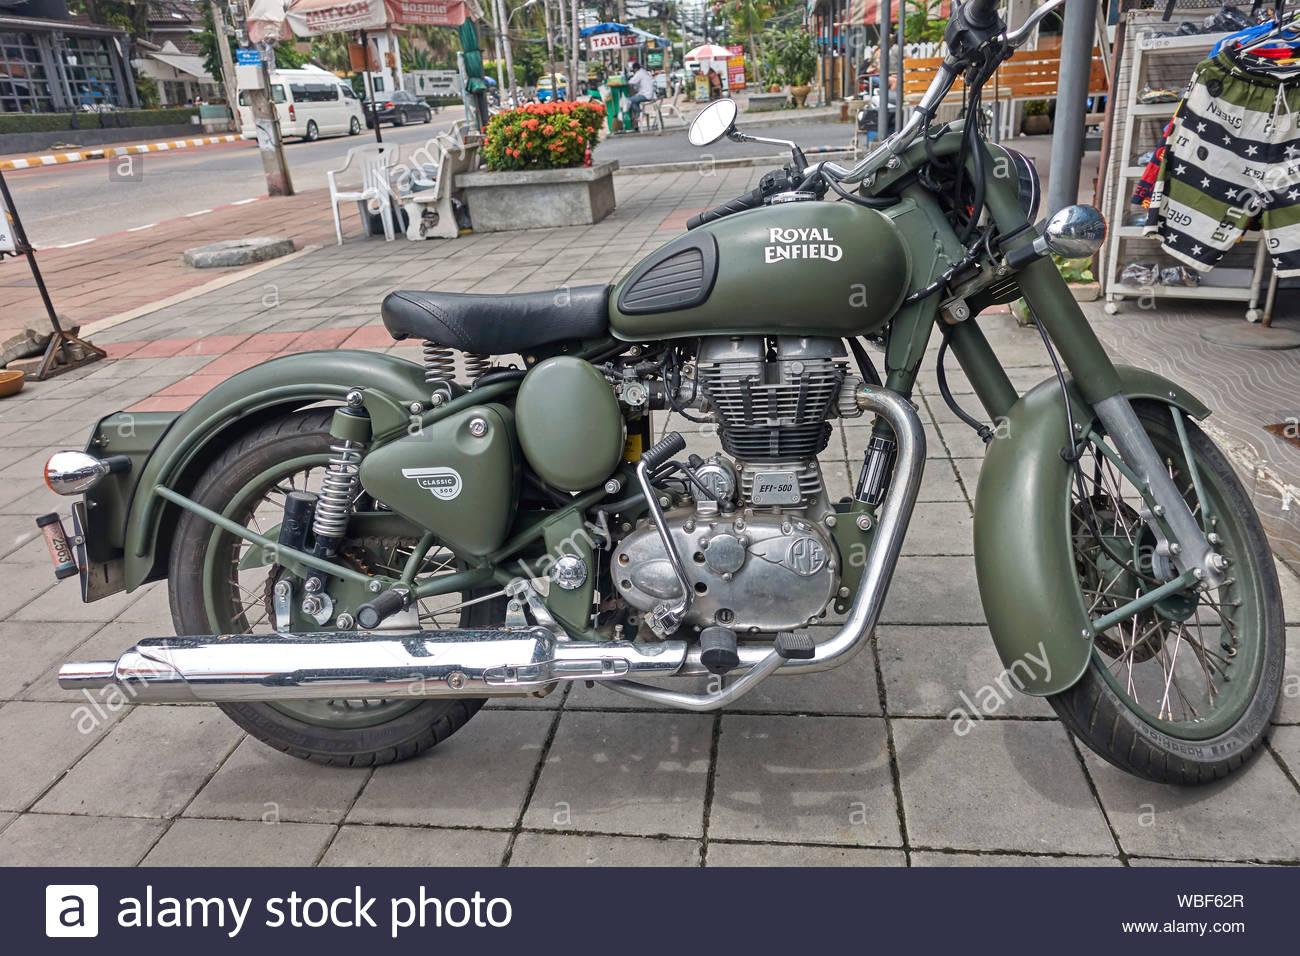 royal-enfield-motorcycle-classic-500-efi